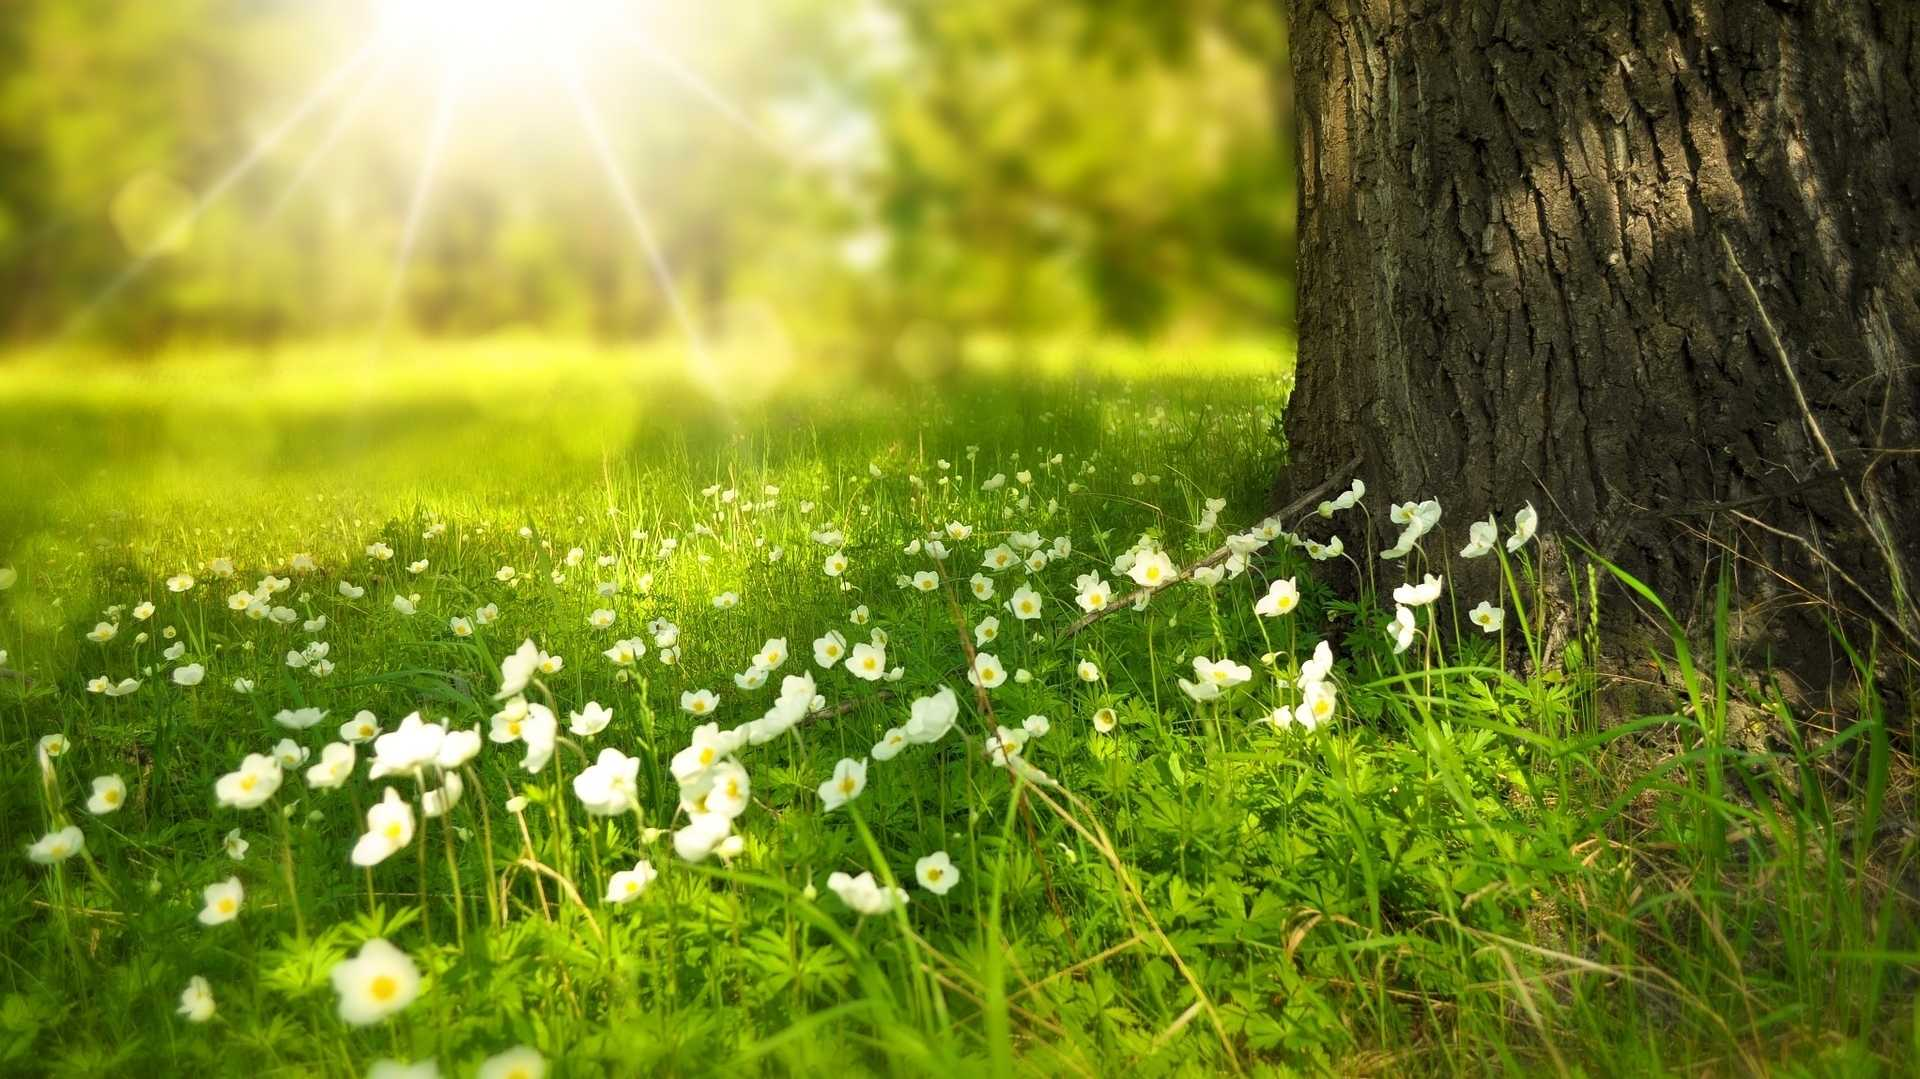 Spring Heise Online